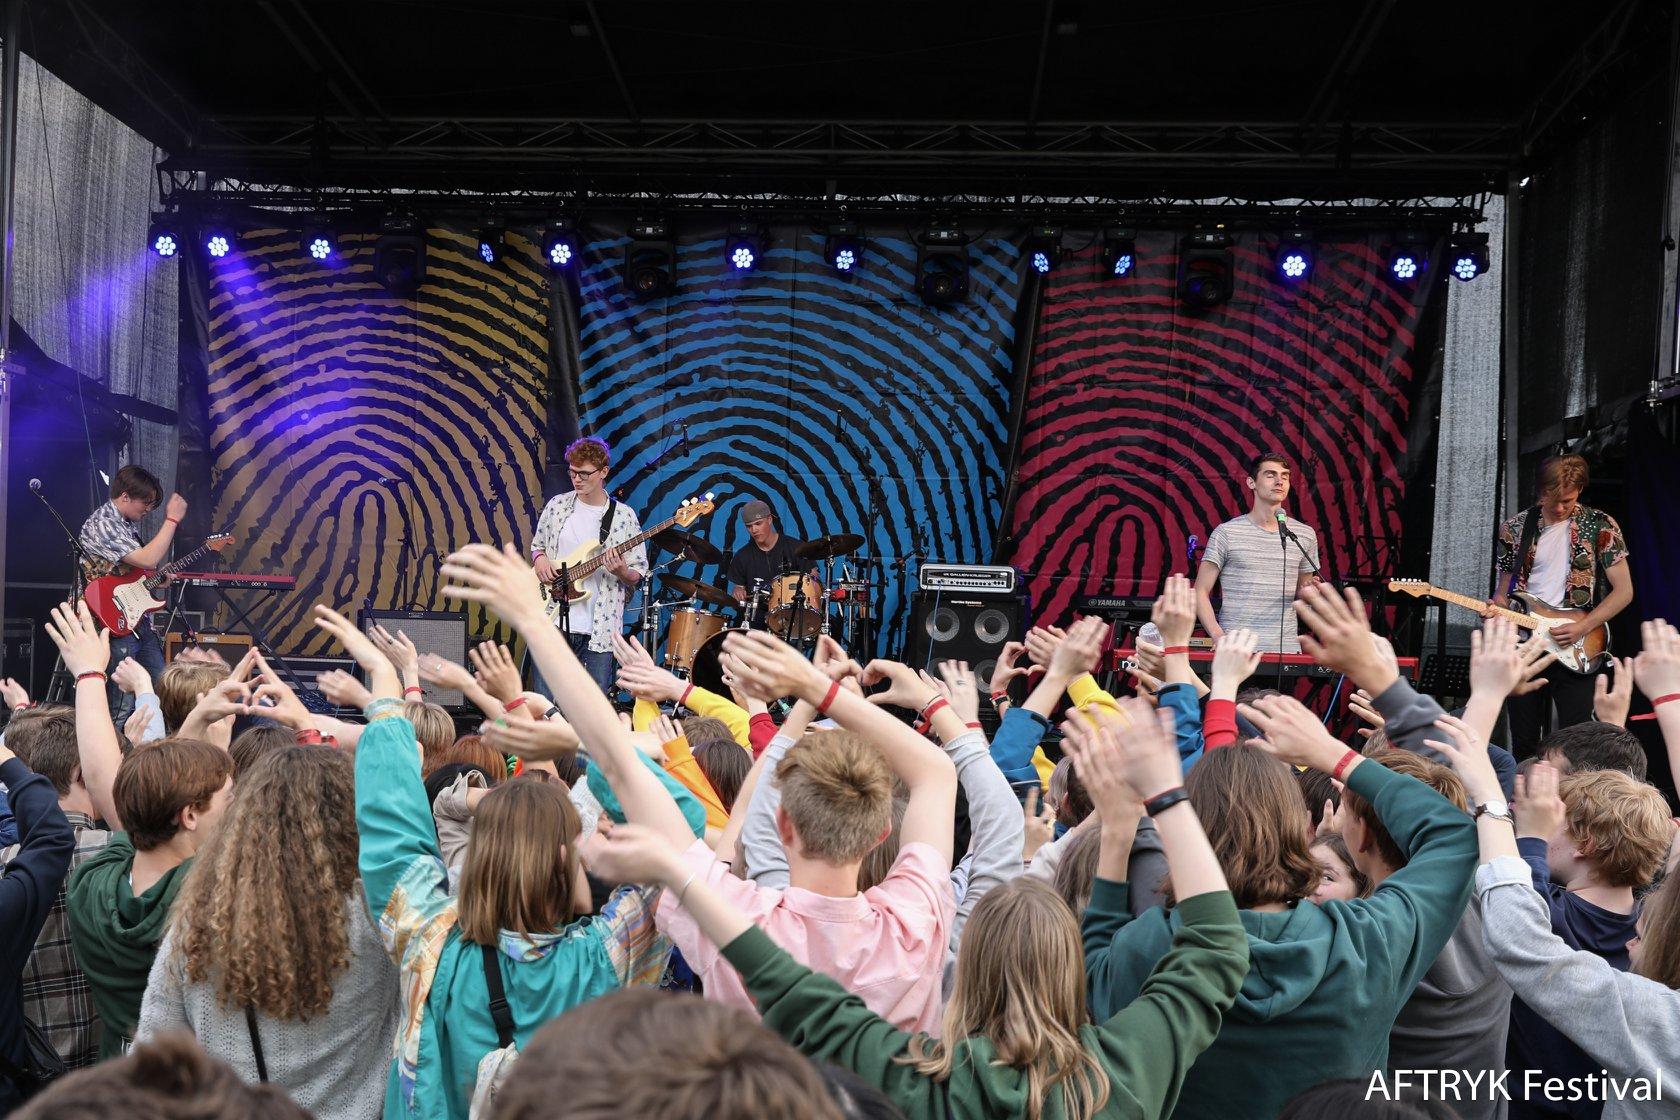 Jylland musikfestival